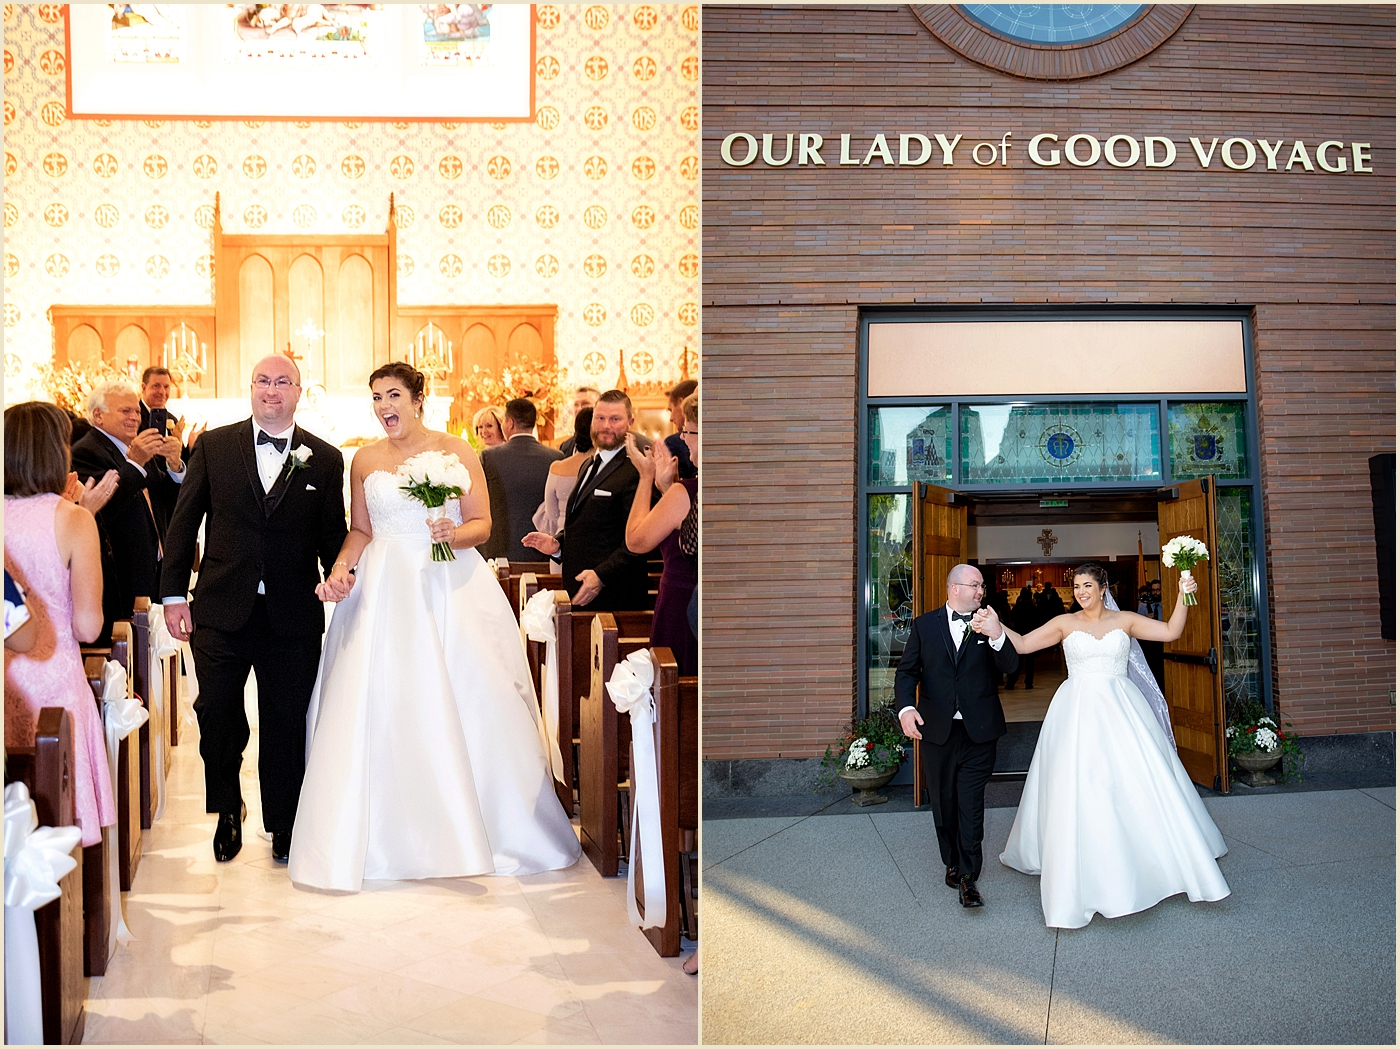 Boston Seaport Wedding Our Lady of Good Voyage